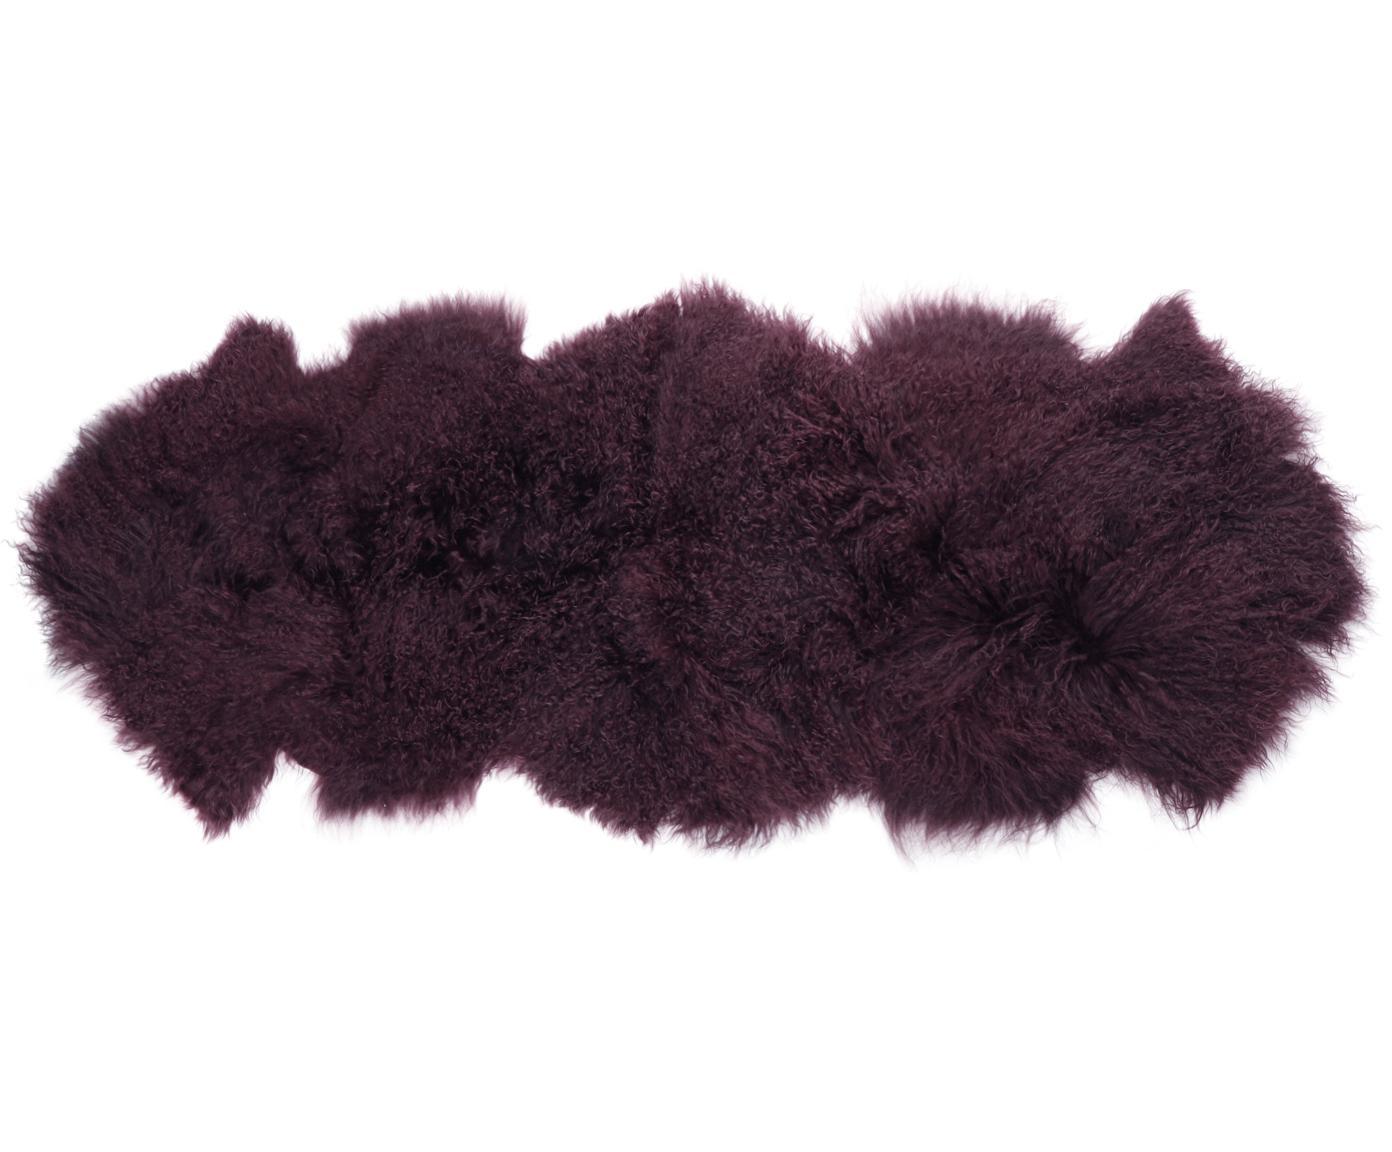 Langhaar-Lammfell Ella, gelockt, Vorderseite: 100% mongolisches Lammfel, Rückseite: 100% Leder, Dunkelrot, 50 x 160 cm